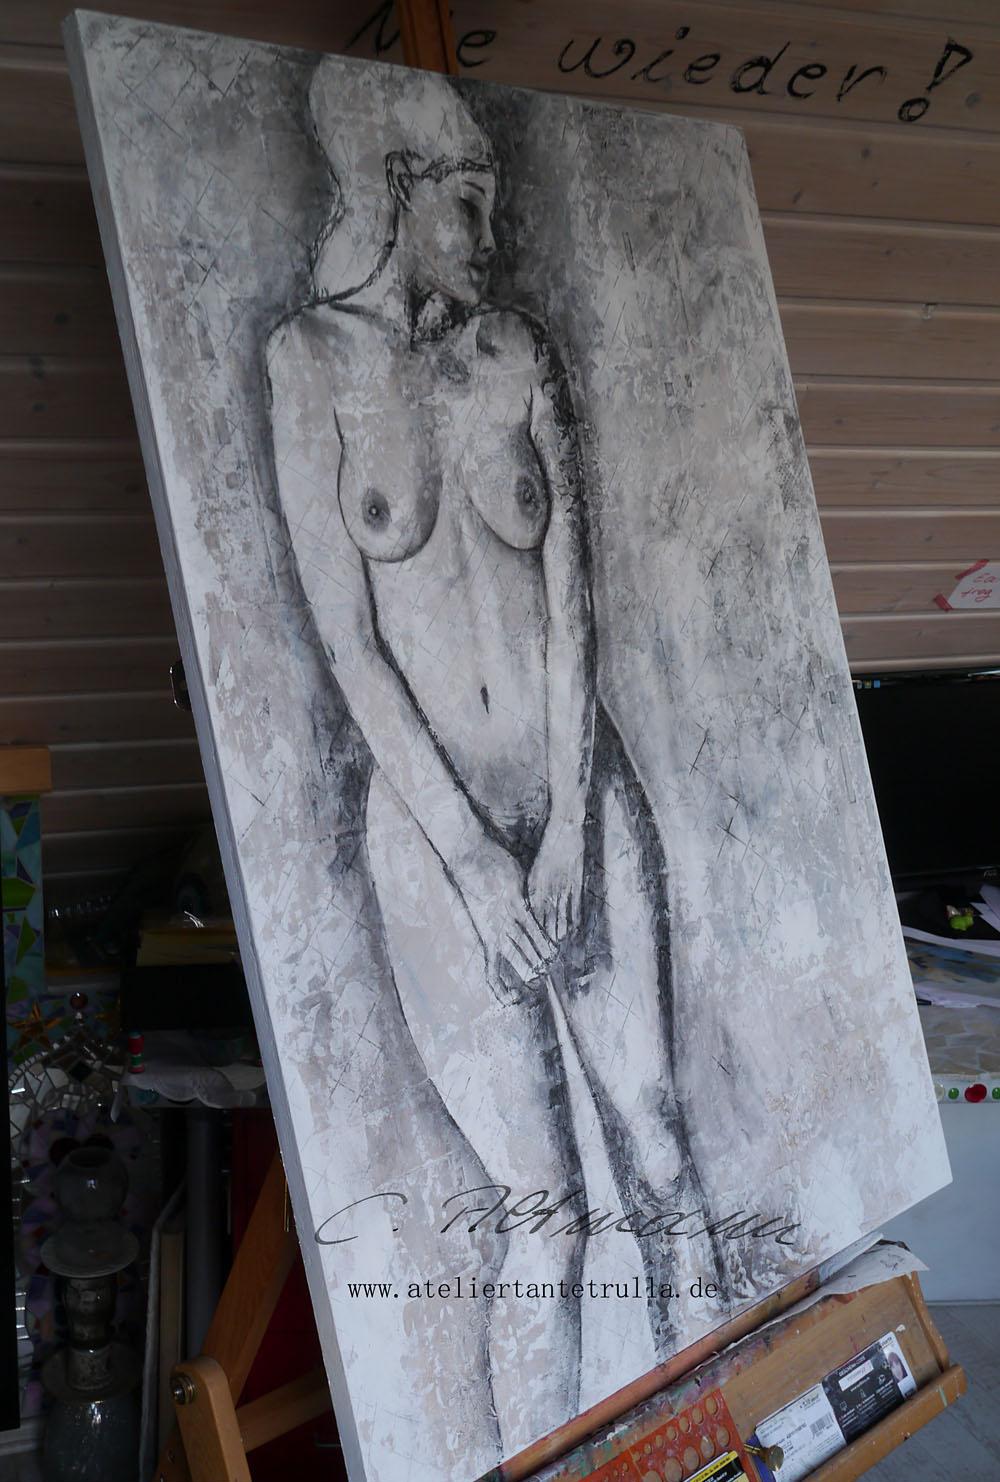 aktmalerei, aktgemaelde, wip, www.ateliertantetrulla.de